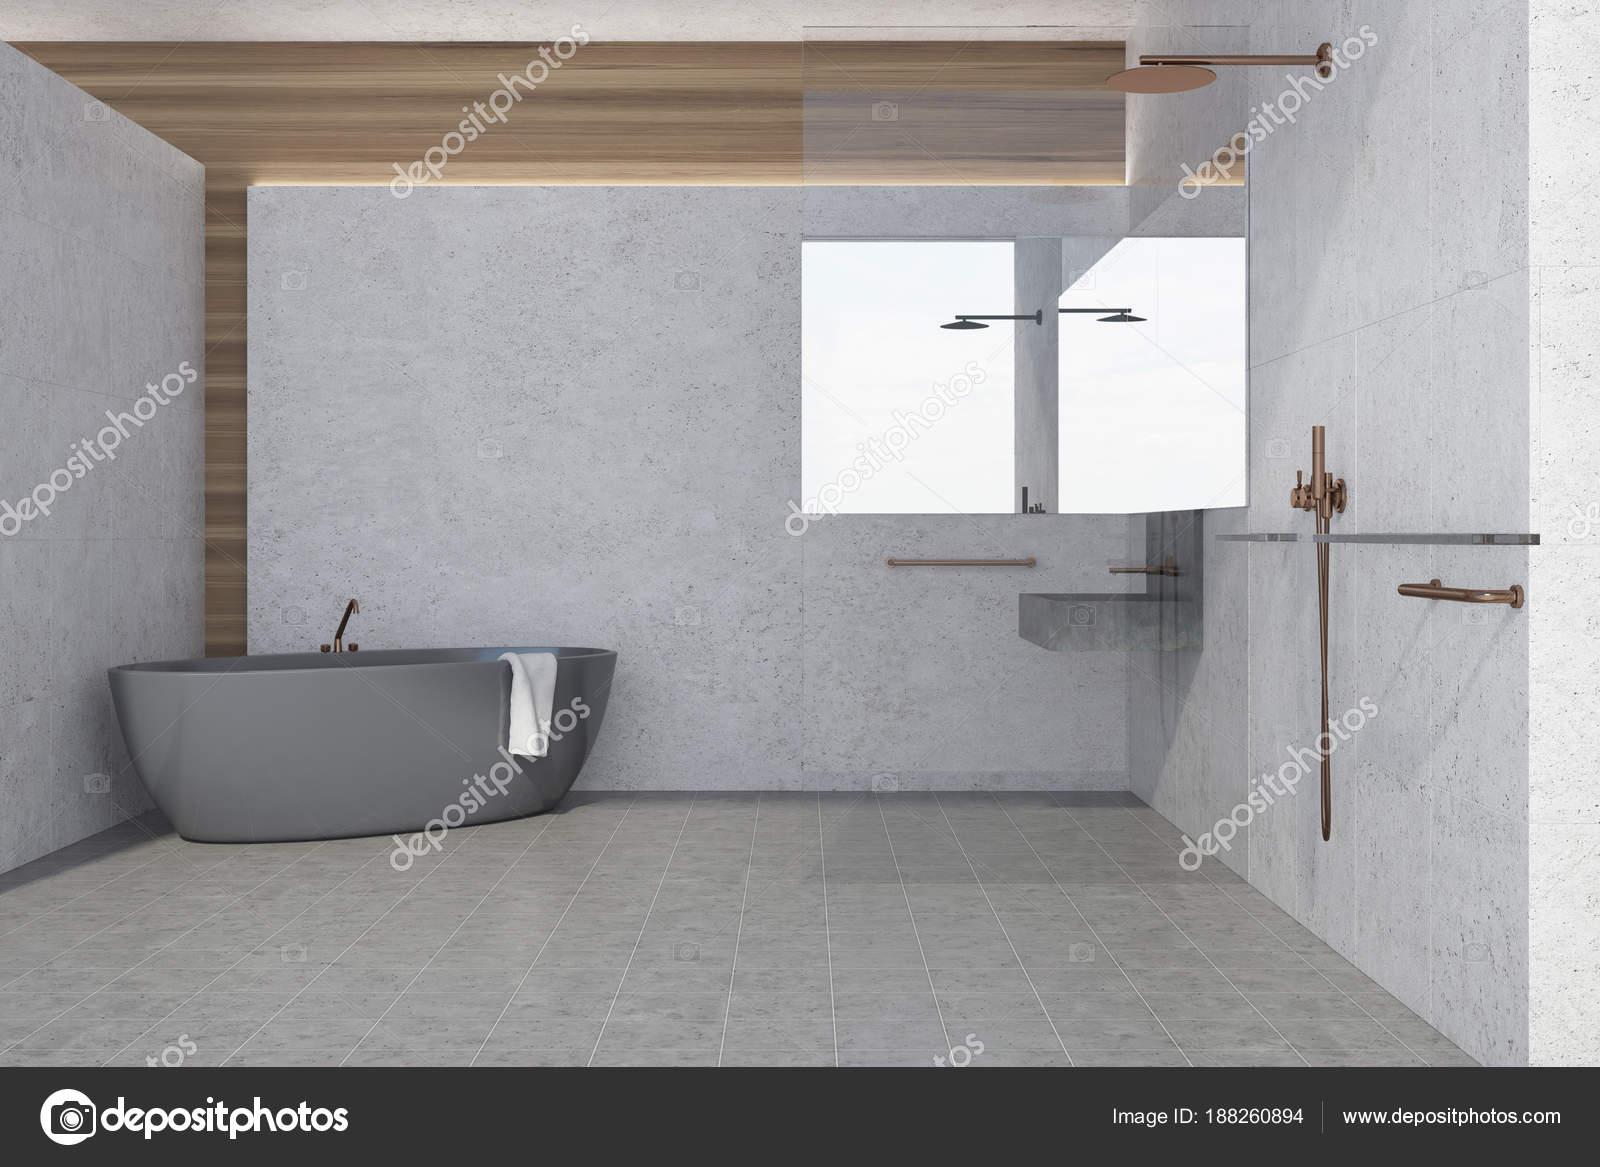 Beton Muur Badkamer : Betonnen muur badkamer interieur grijze tub u2014 stockfoto